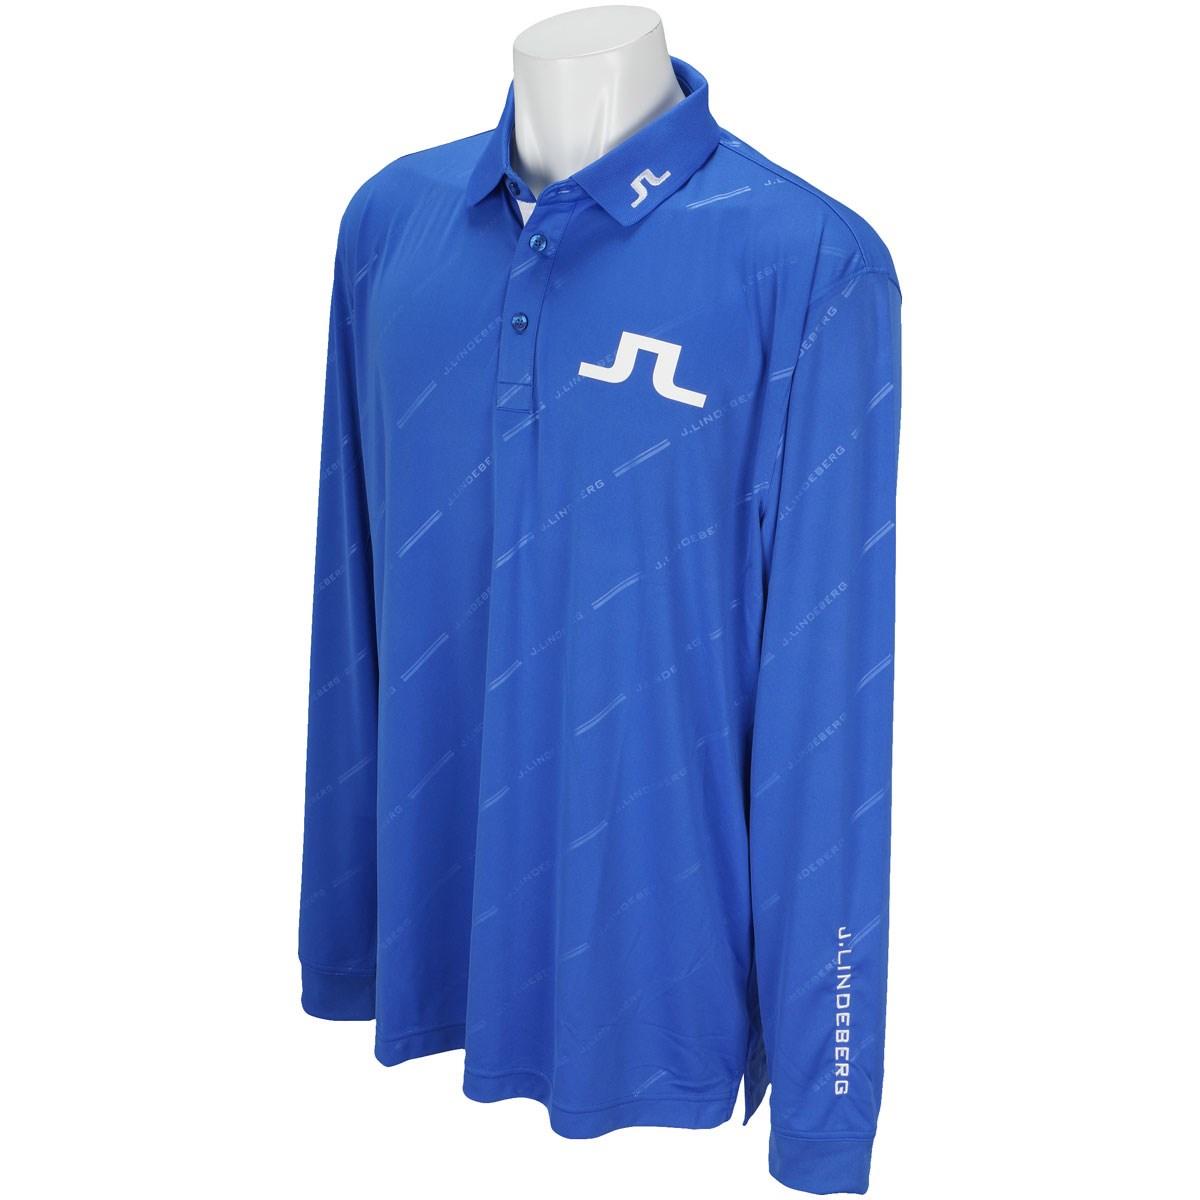 J.リンドバーグ J.LINDEBERG GDO限定 TOUR TECH REG TX Jersey +(Tonal debossed graphic on) 長袖ポロシャツ 50 ブルー